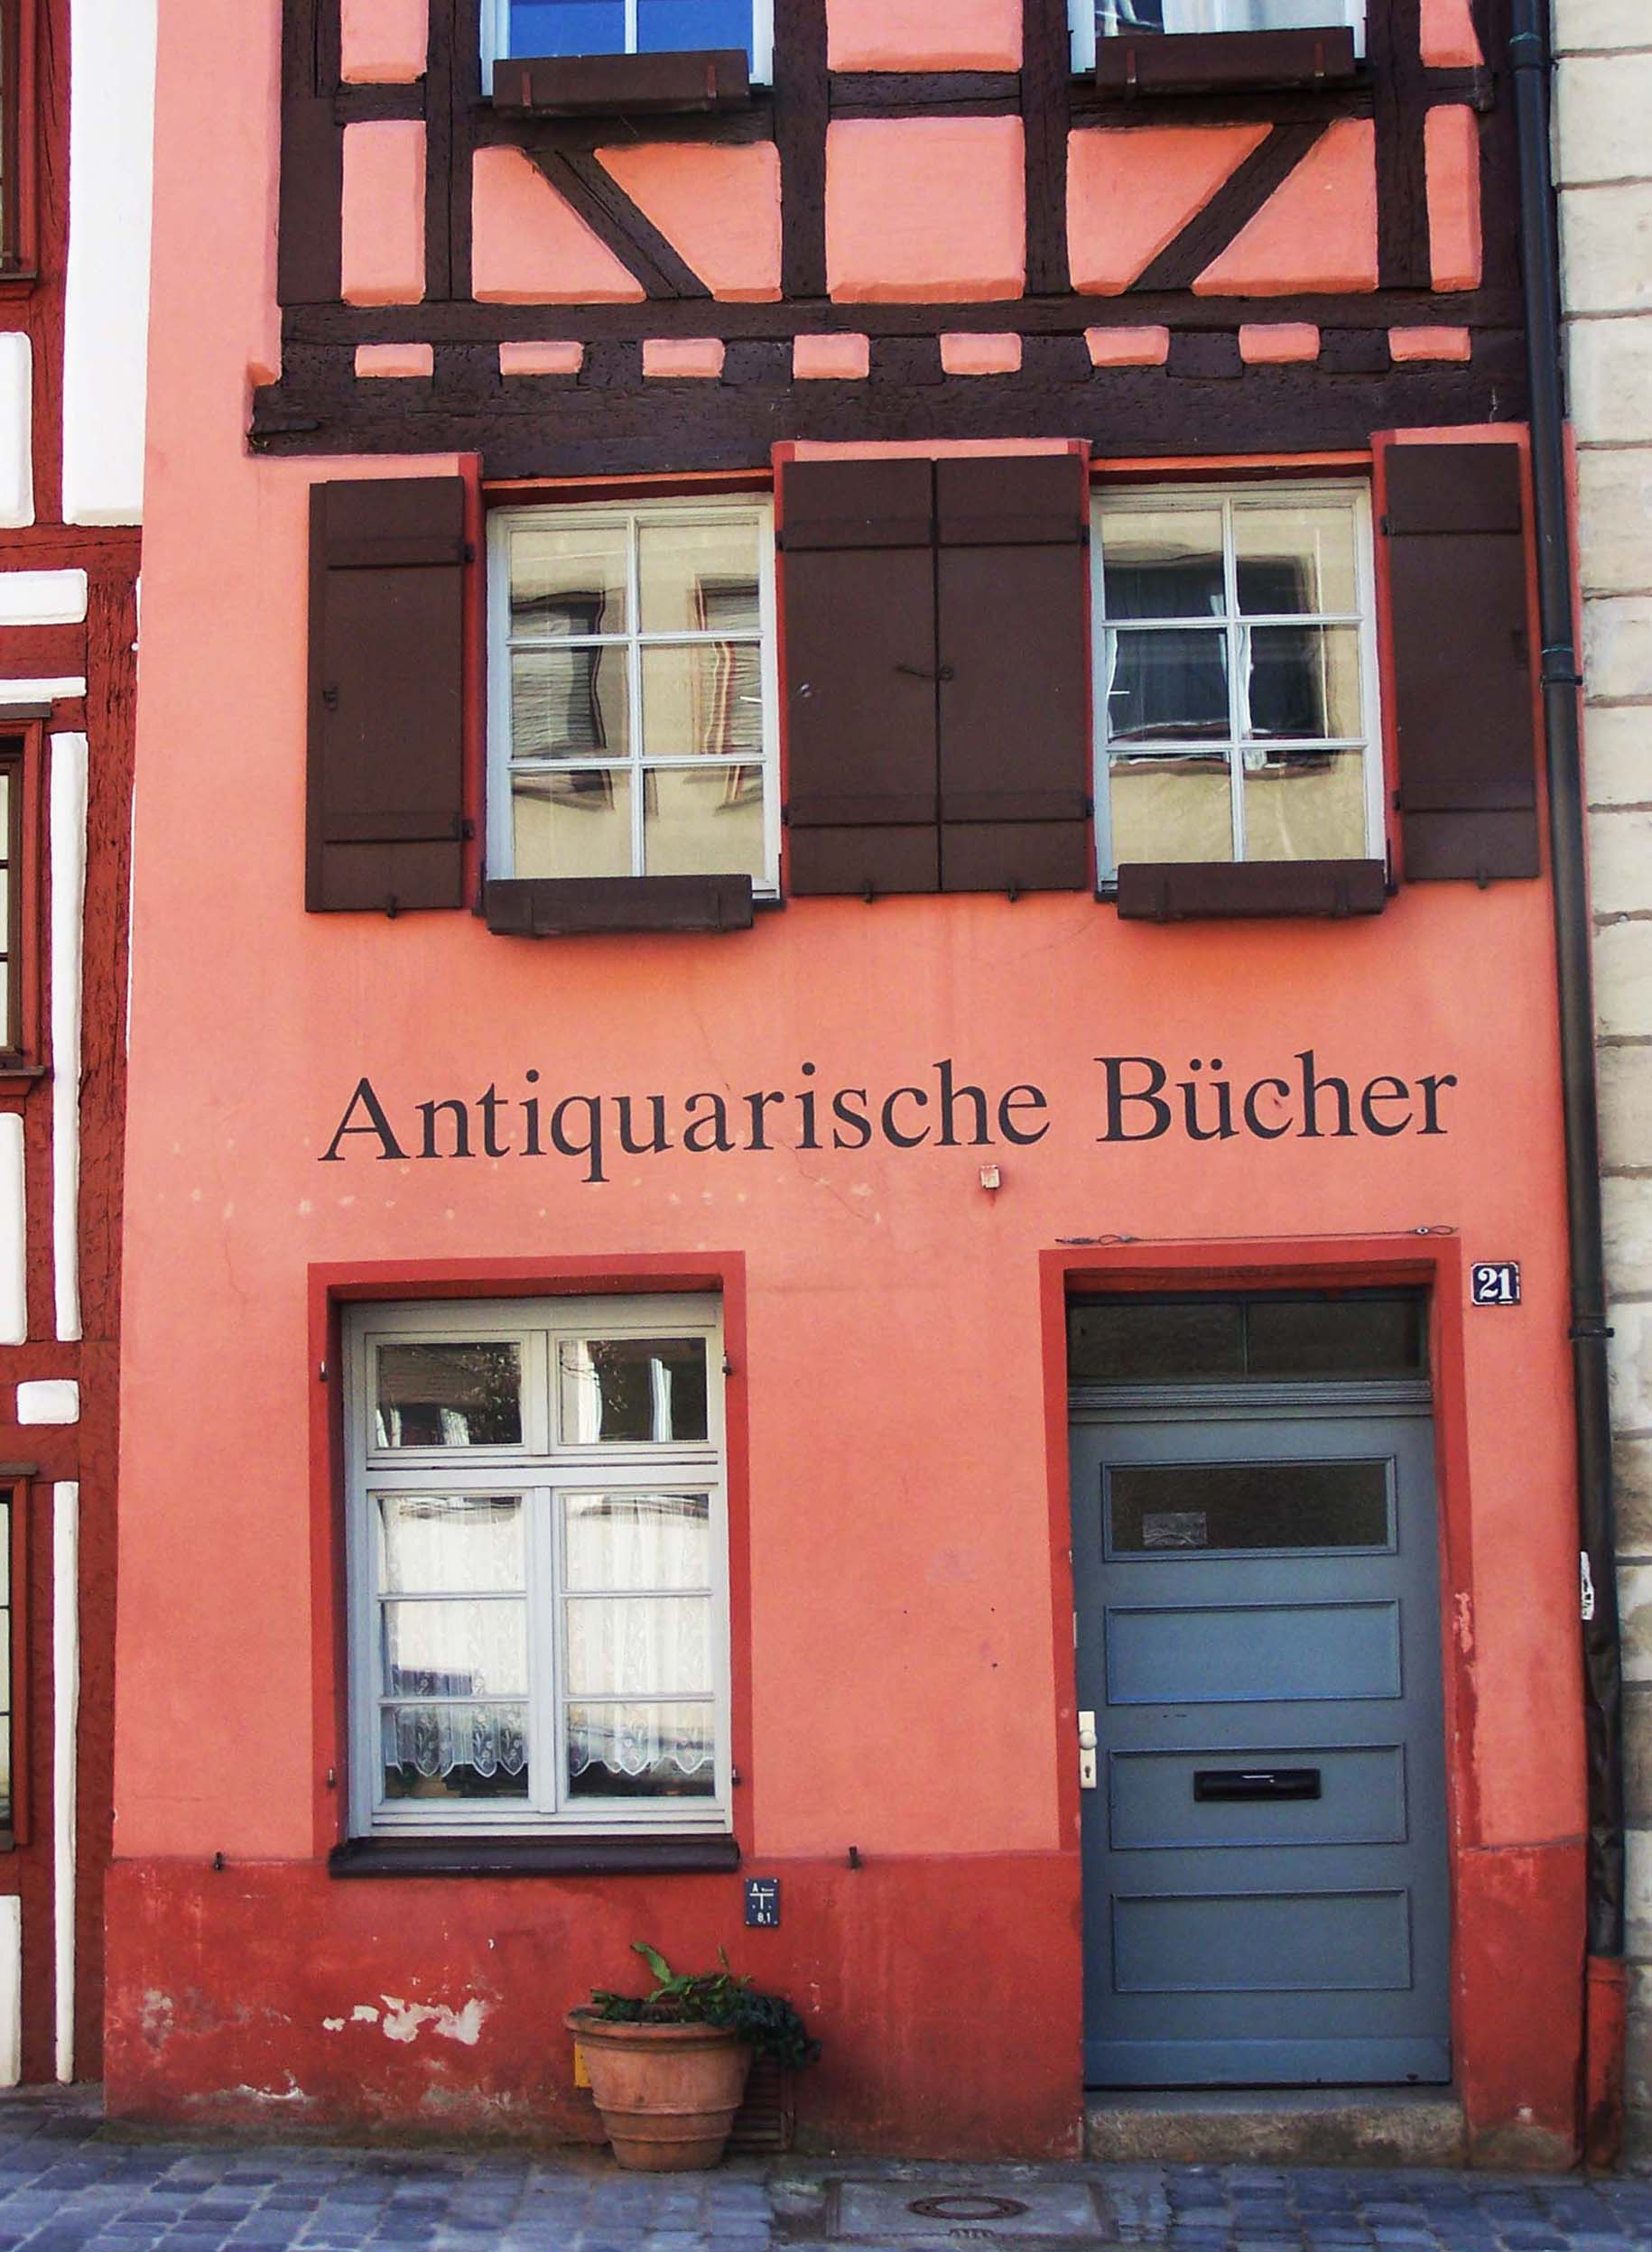 Antiquarische Bücher, Weißgerbergasse 21, Nürnberg Altstadt